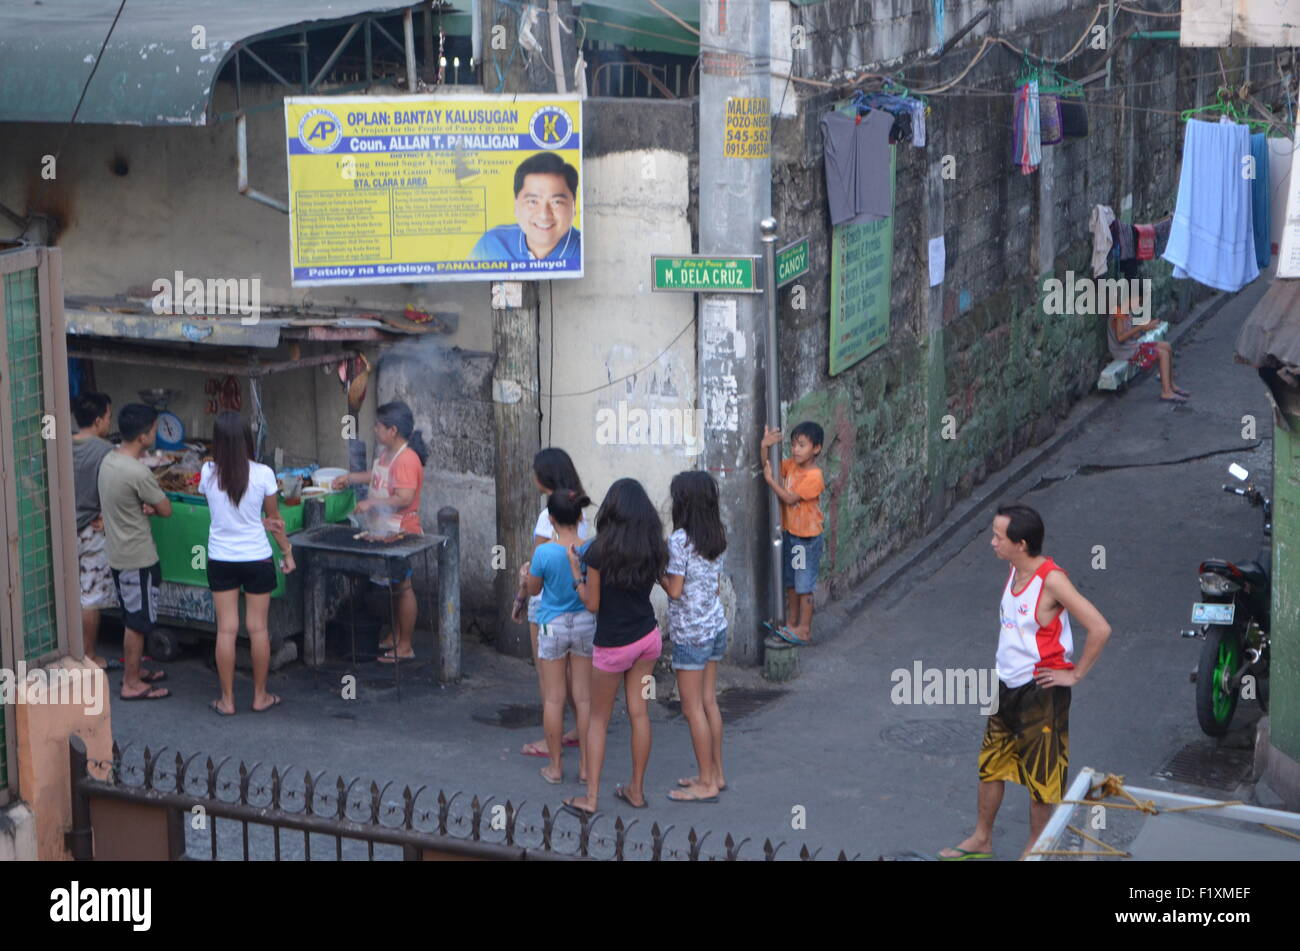 M.Dela Cruz, Manila.A street corner where crowds gather to taste fresh adobo, or fresh chicken, orsausagesbeing - Stock Image